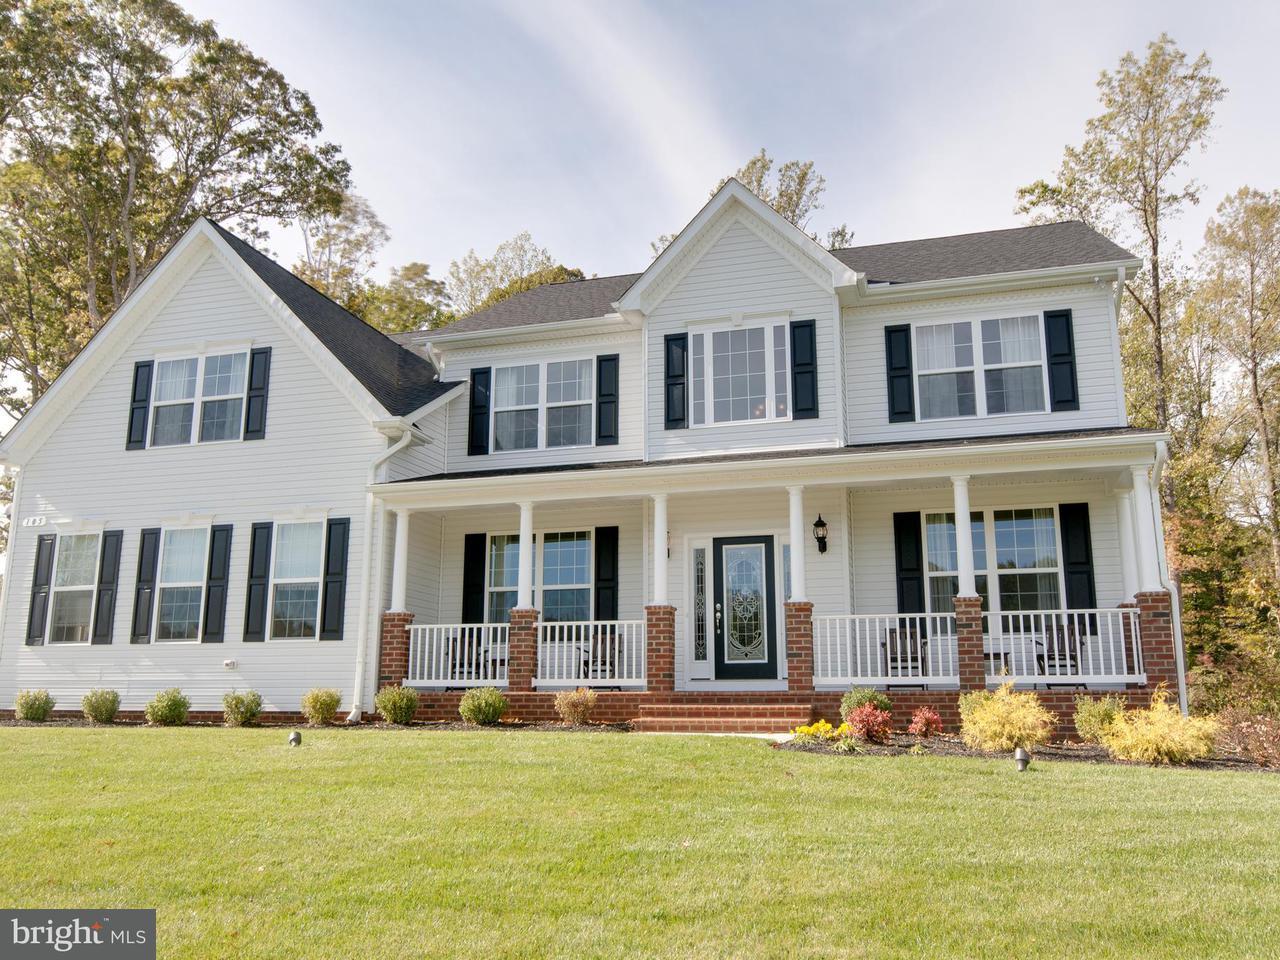 Casa Unifamiliar por un Venta en 2401 SENATE Court 2401 SENATE Court Prince Frederick, Maryland 20678 Estados Unidos